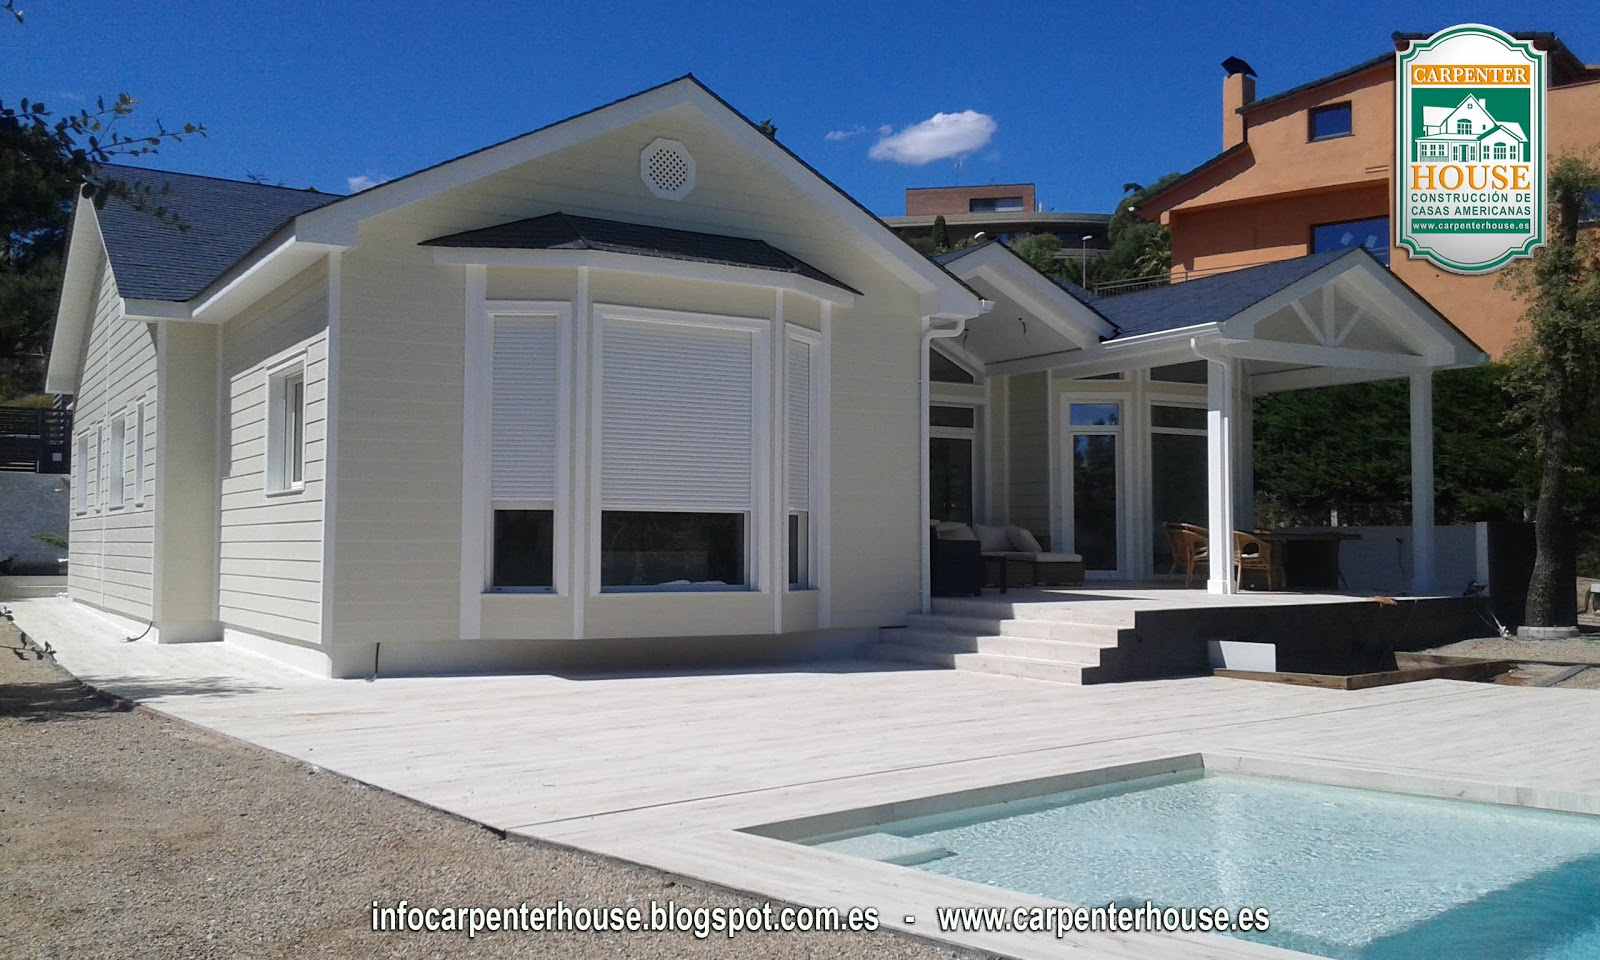 Carpenter house 7 fase construcci n casa en el vall s - Casas en valles occidental ...